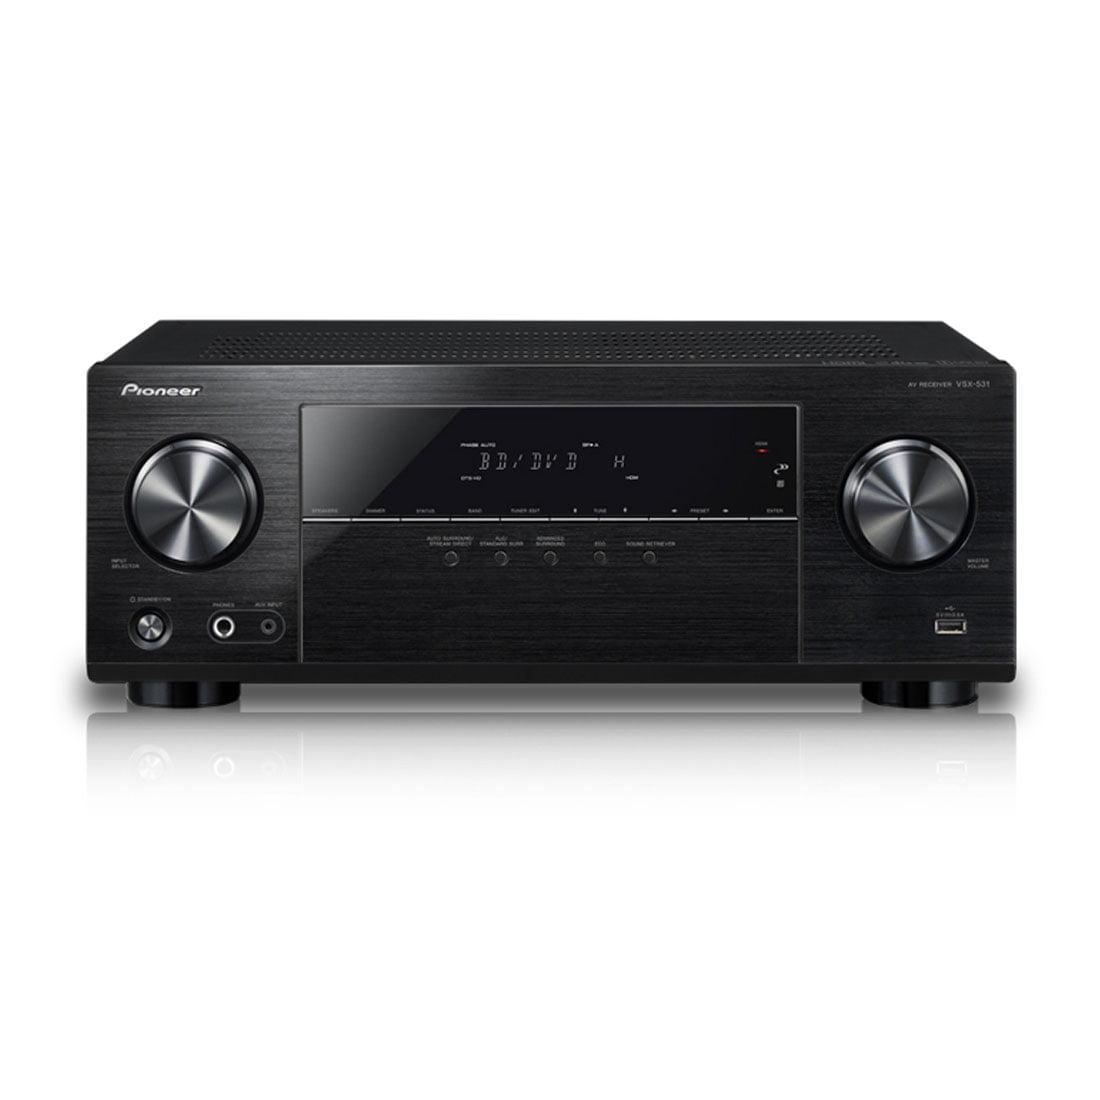 Pioneer vsx-531 - Pioneer Ampli audio video in vendita su